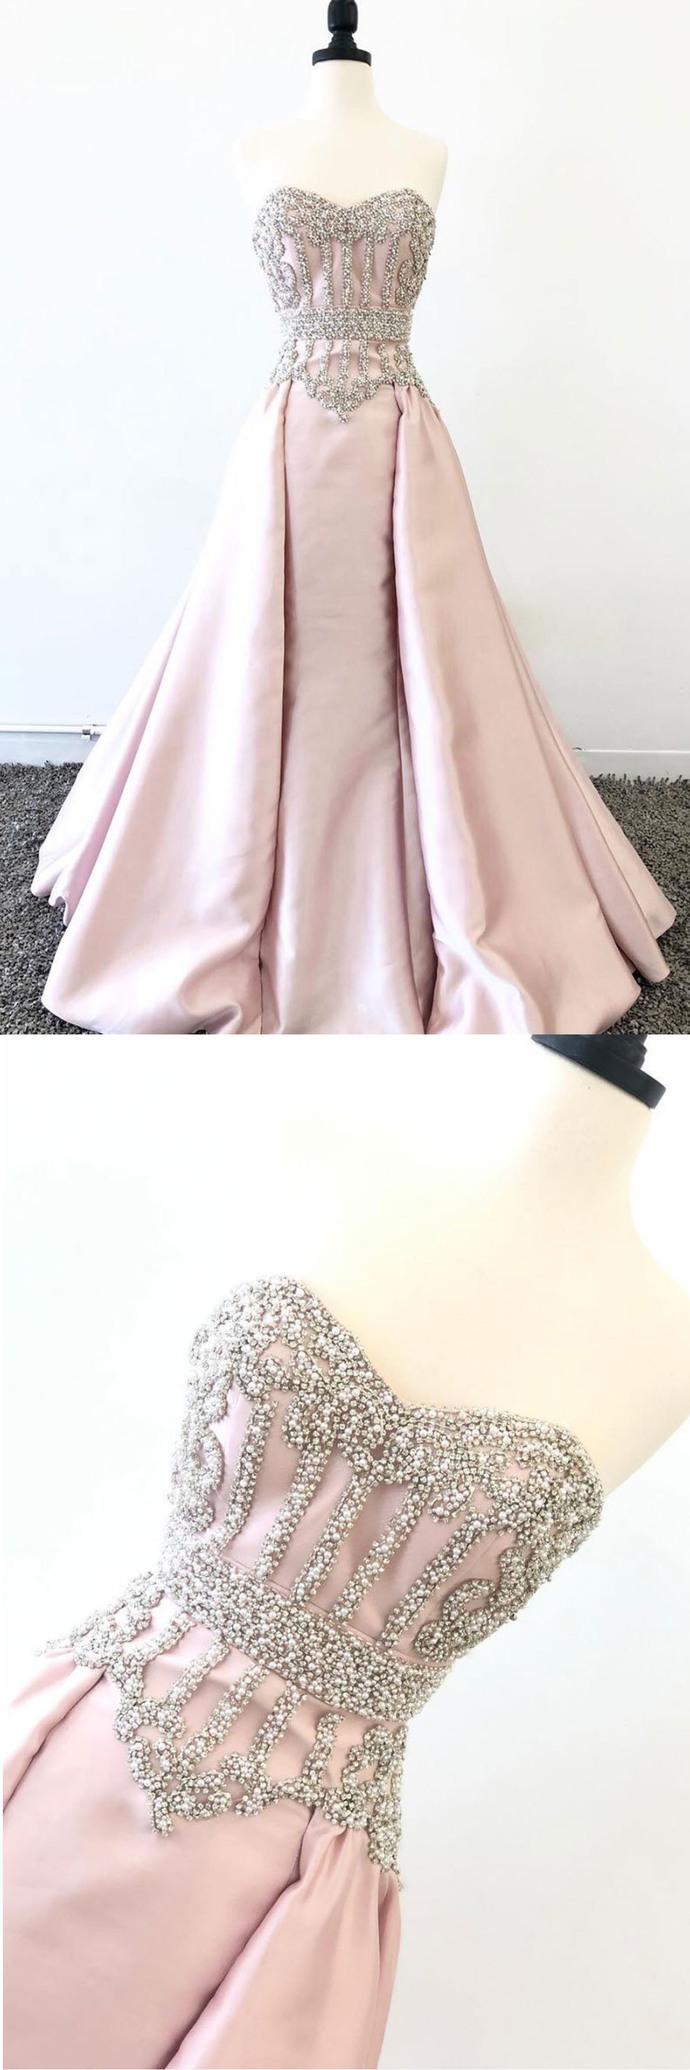 Sweetheart Neck Pink Satin Pearl Beaded Long Prom Dress, Evening Dress D-080